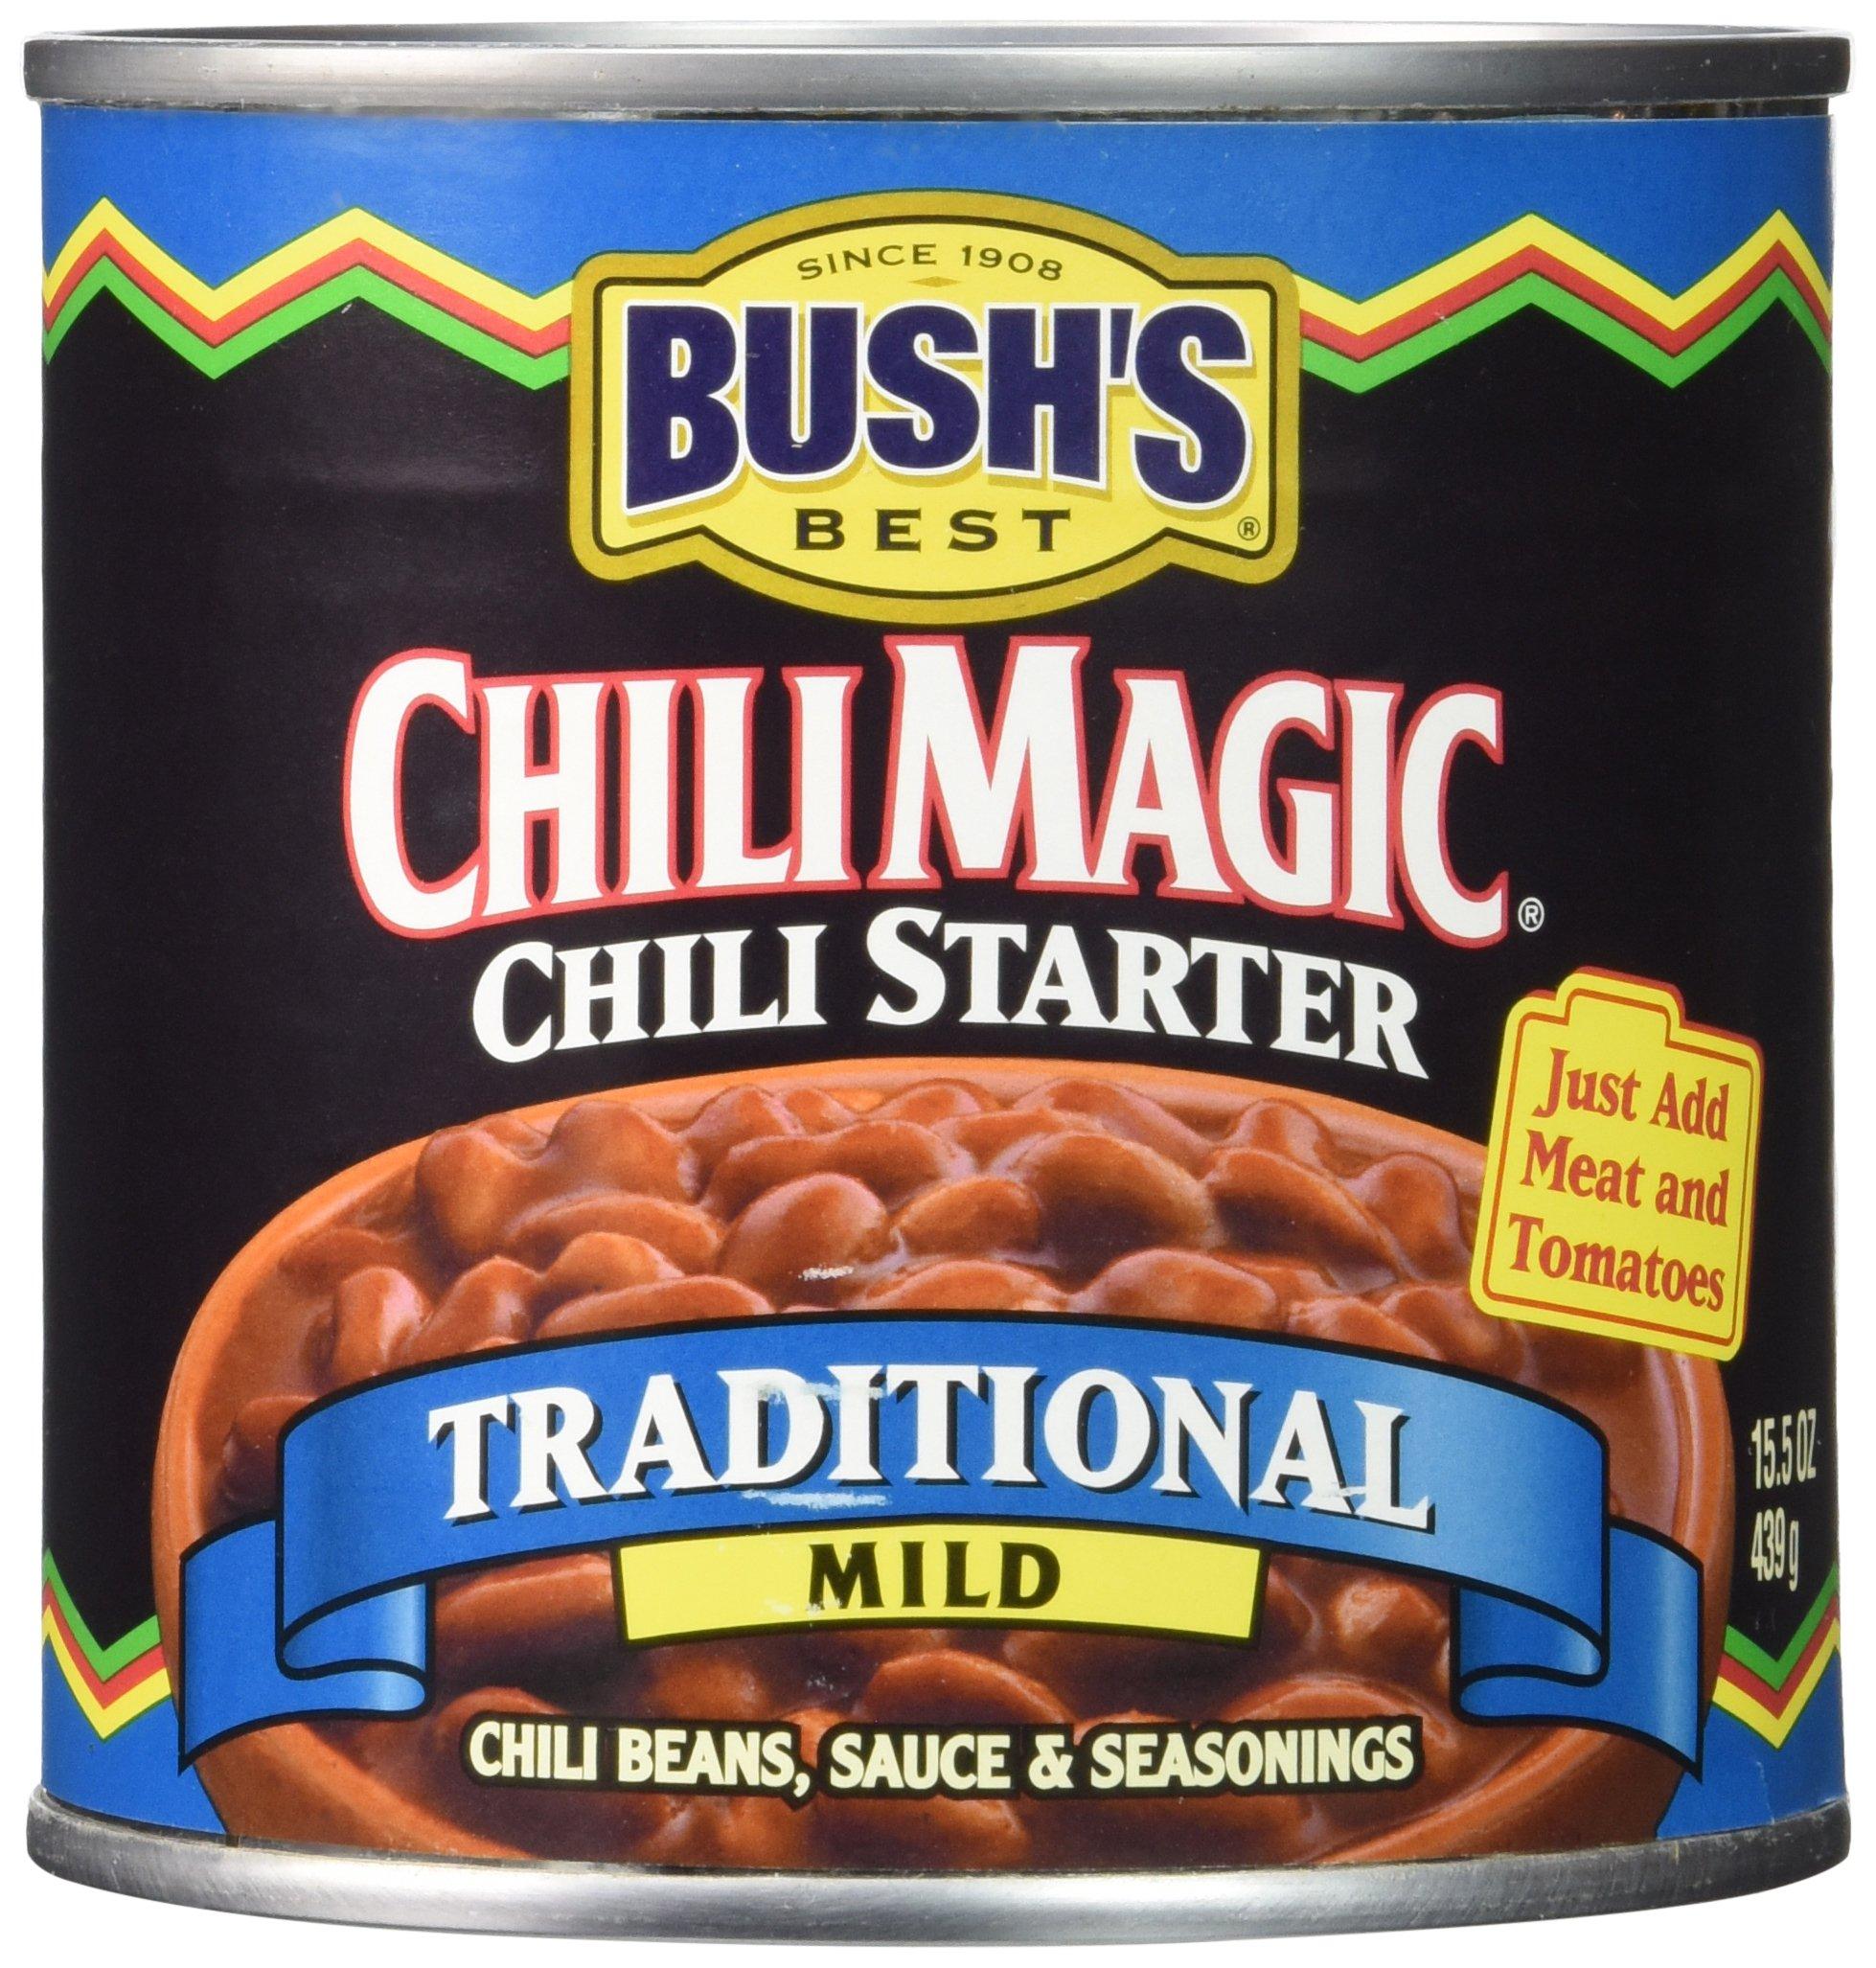 Bush's Best Chili Magic Traditional Mild Chili Starter (Case of 12)